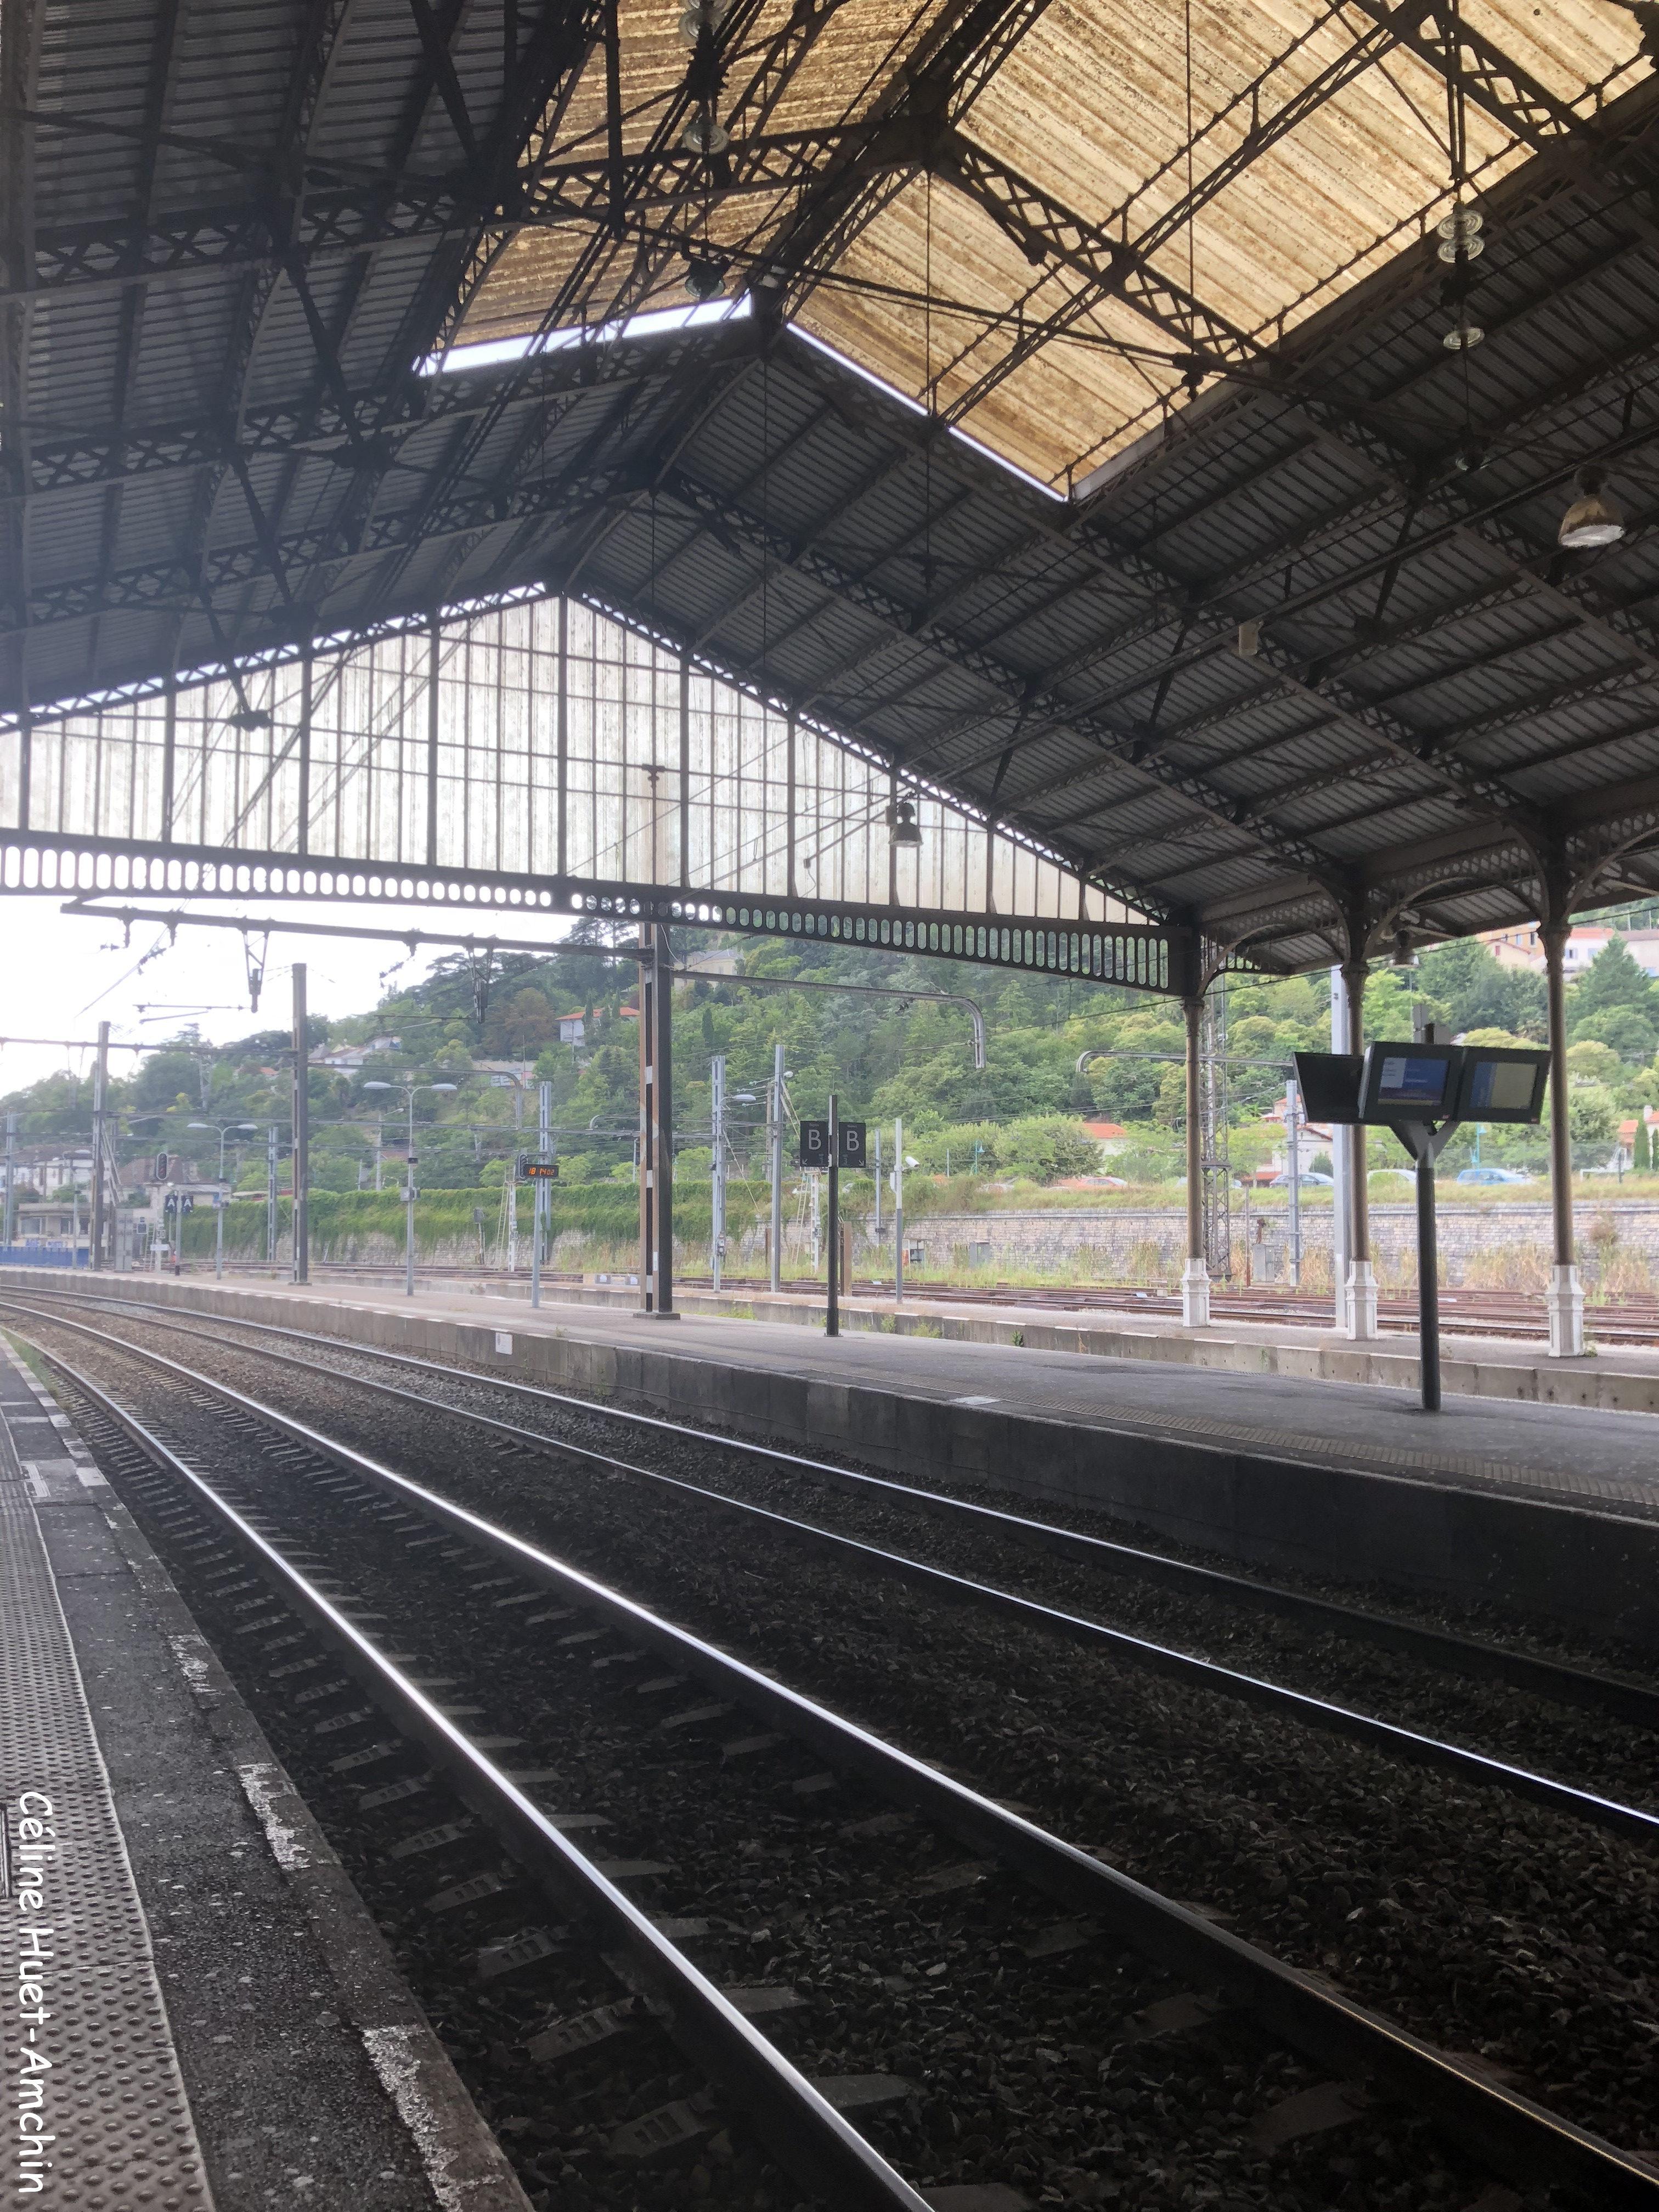 Gare d'Agen France